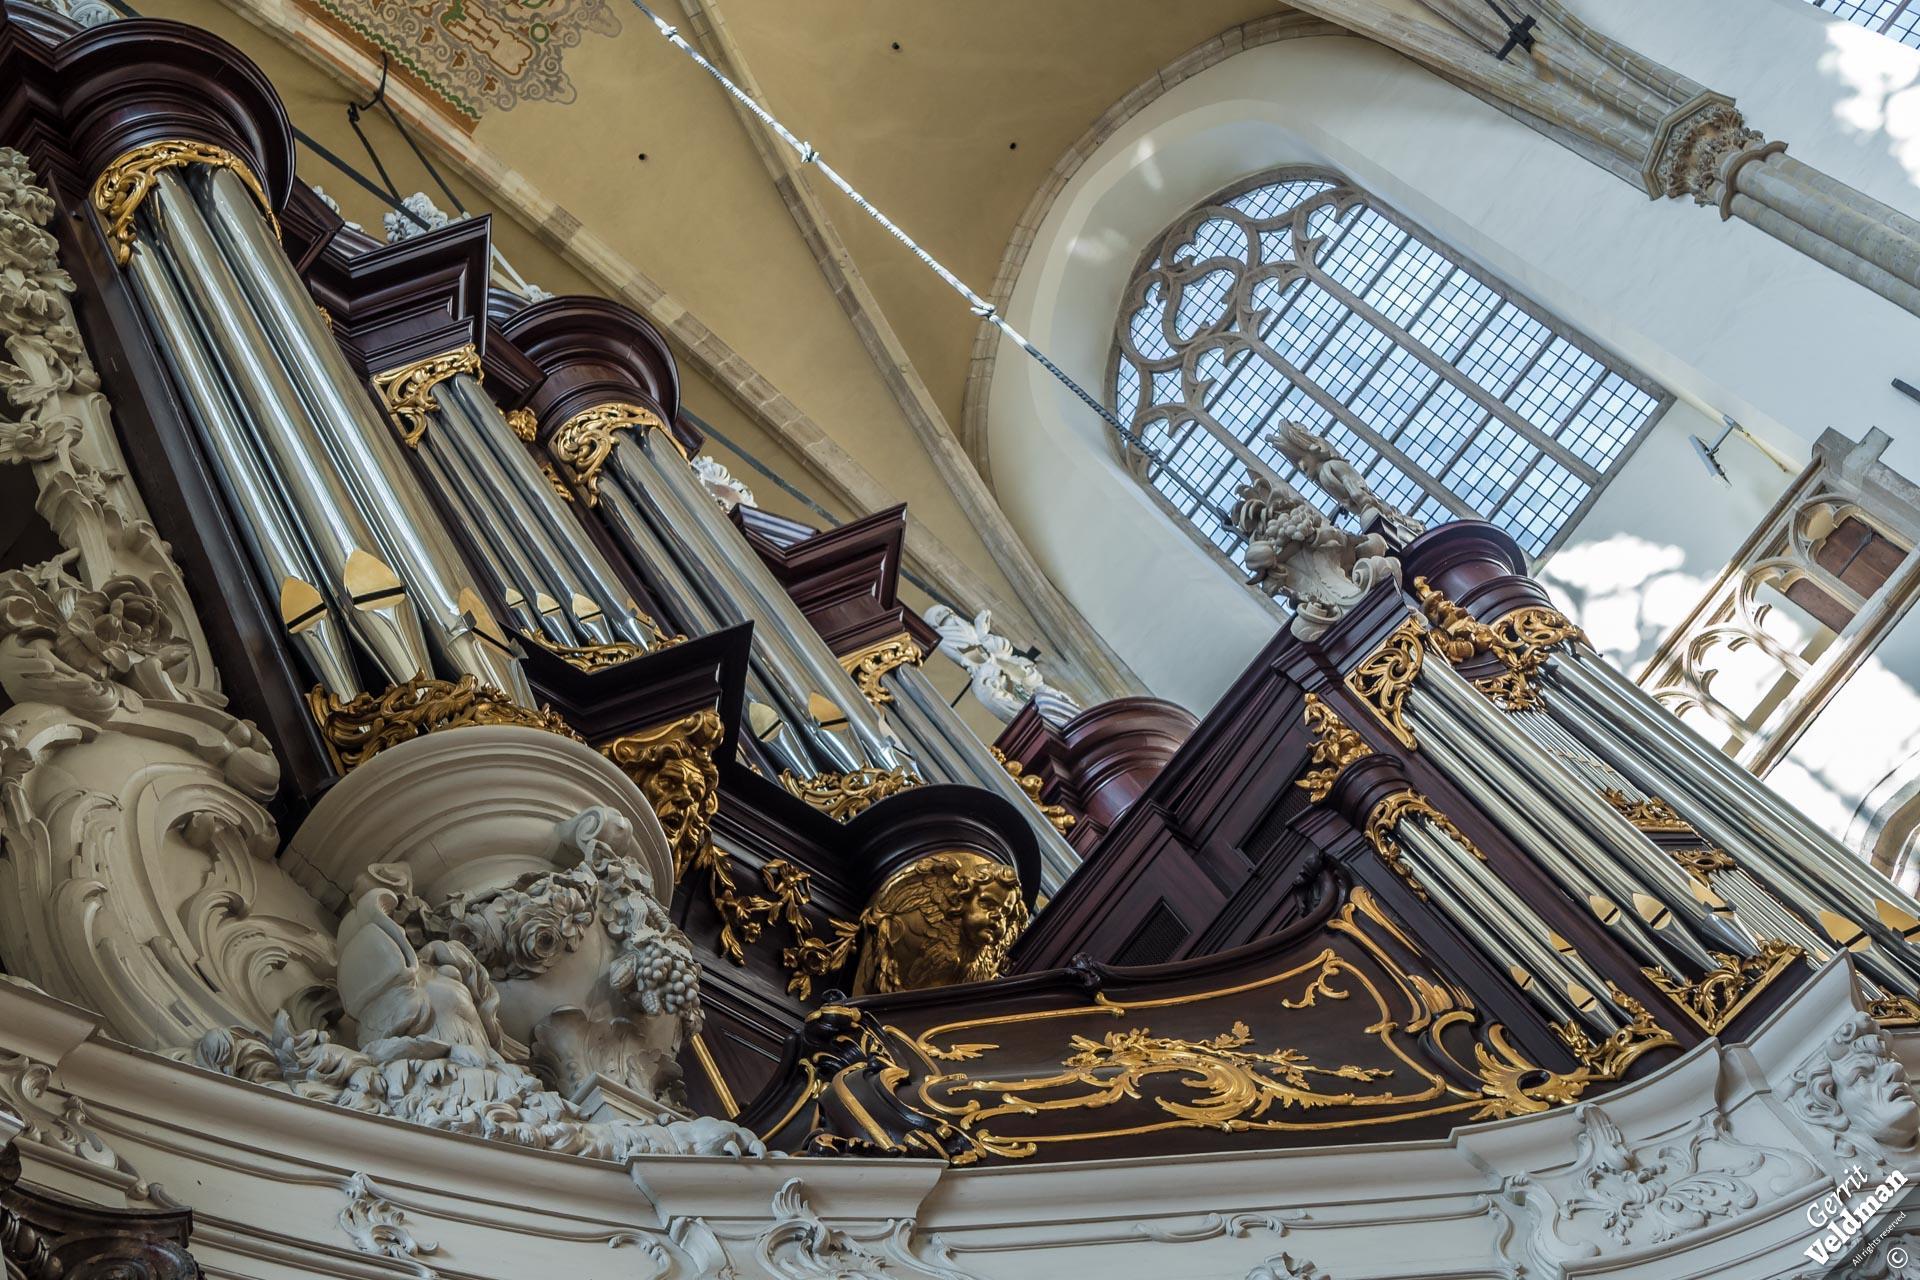 Kam-orgel, Grote Kerk, Dordrecht